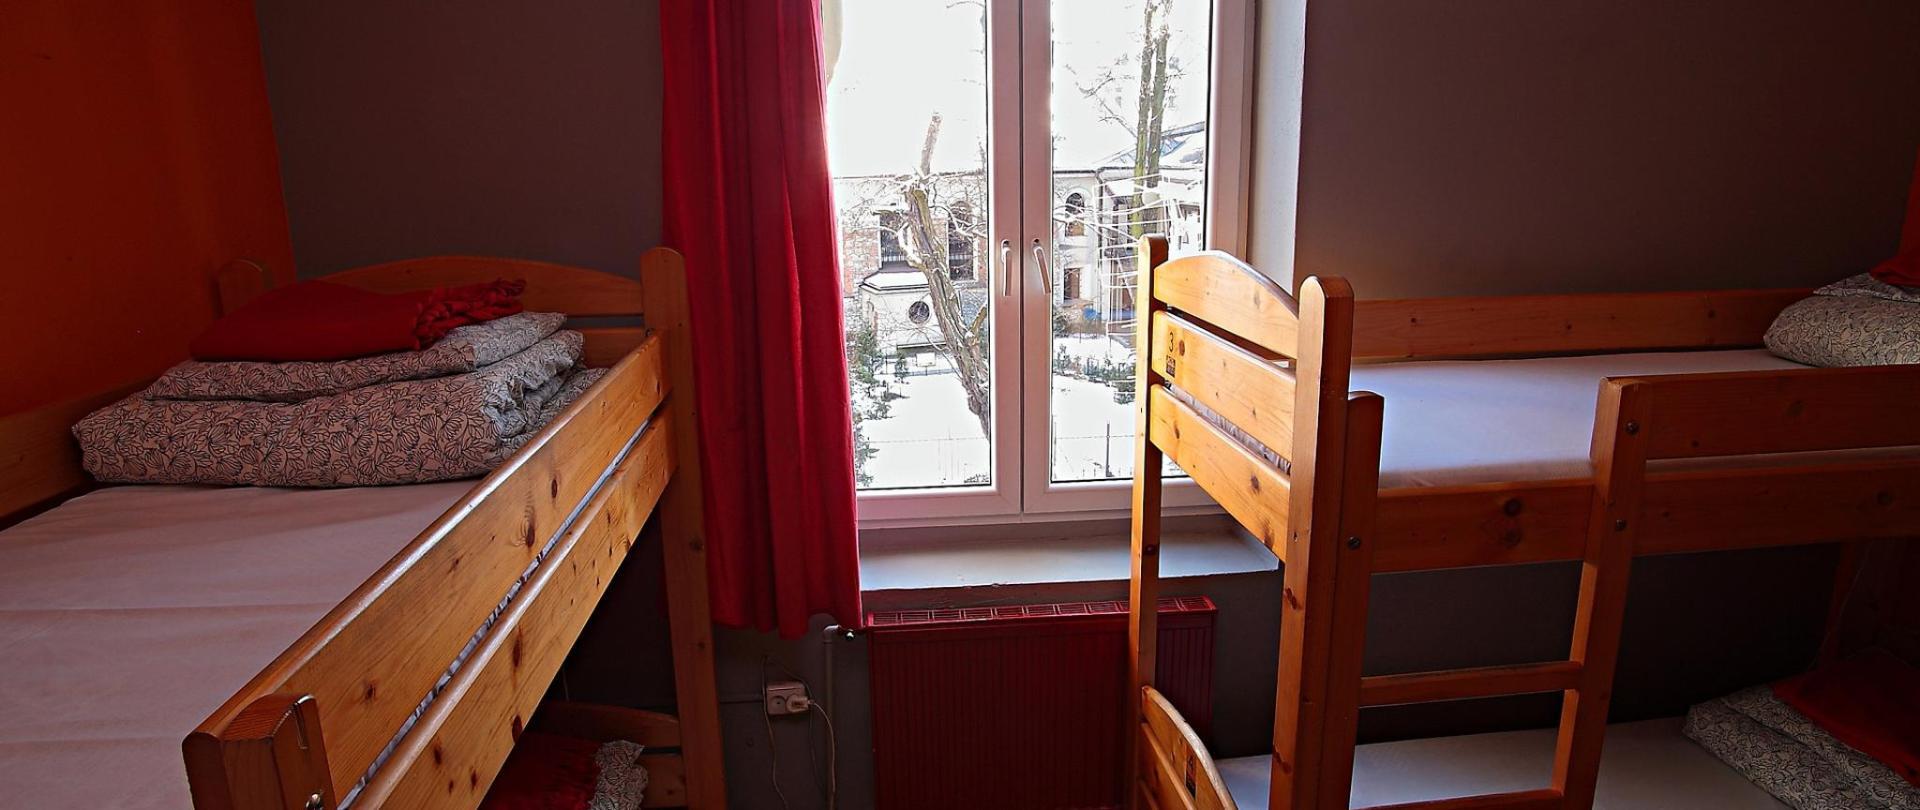 Hostel Momotown